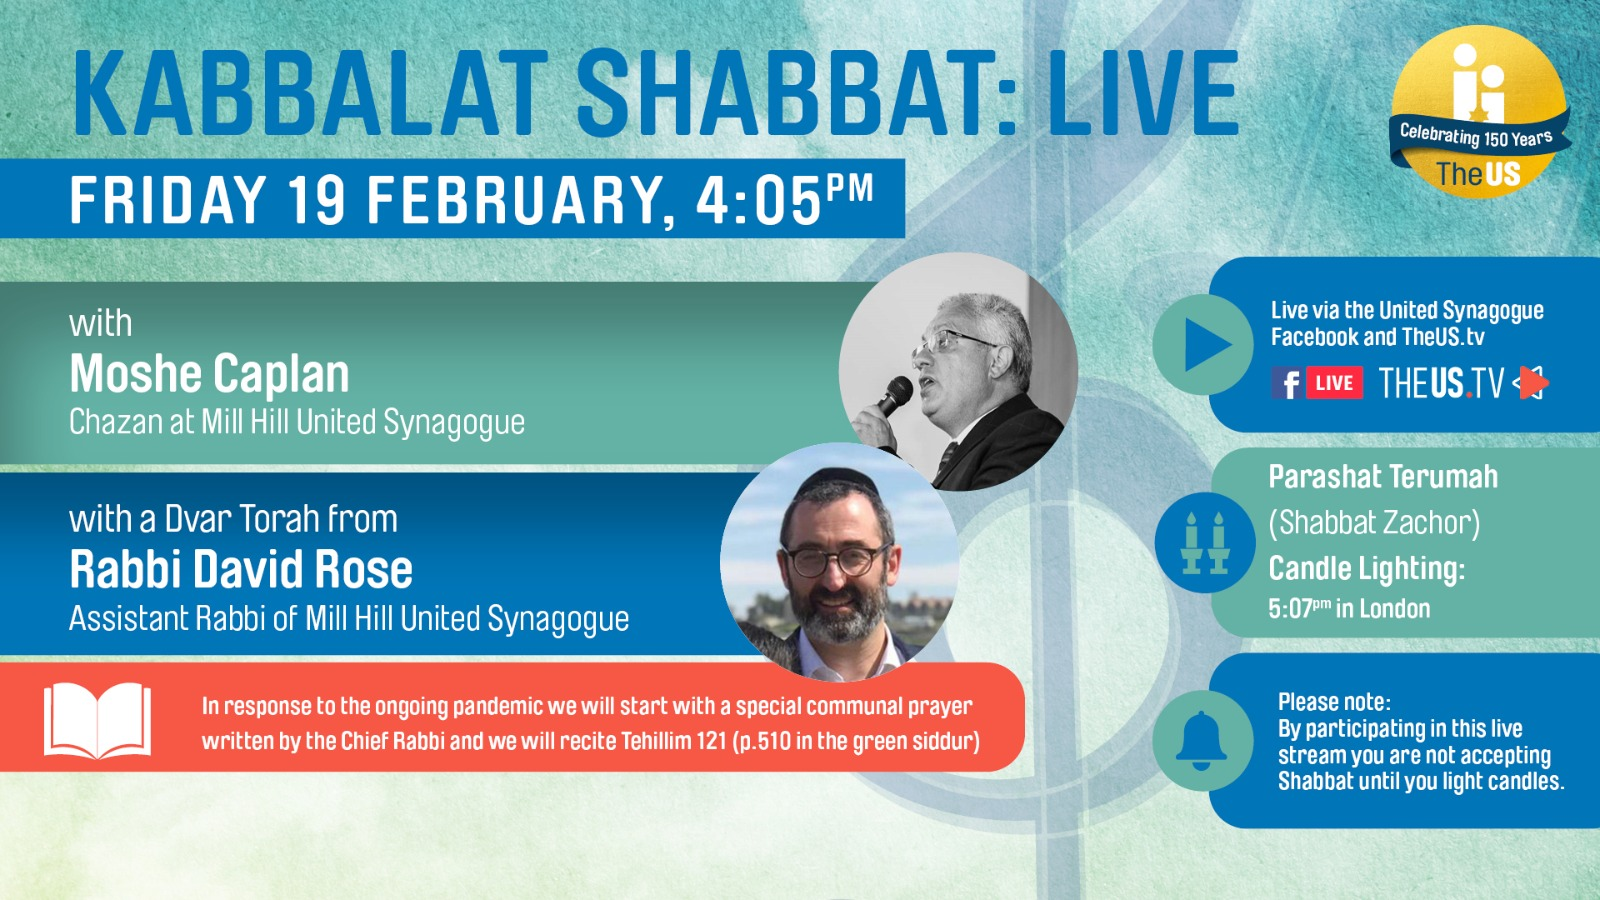 Kabbalat Shabbat: Live at 4:05pm